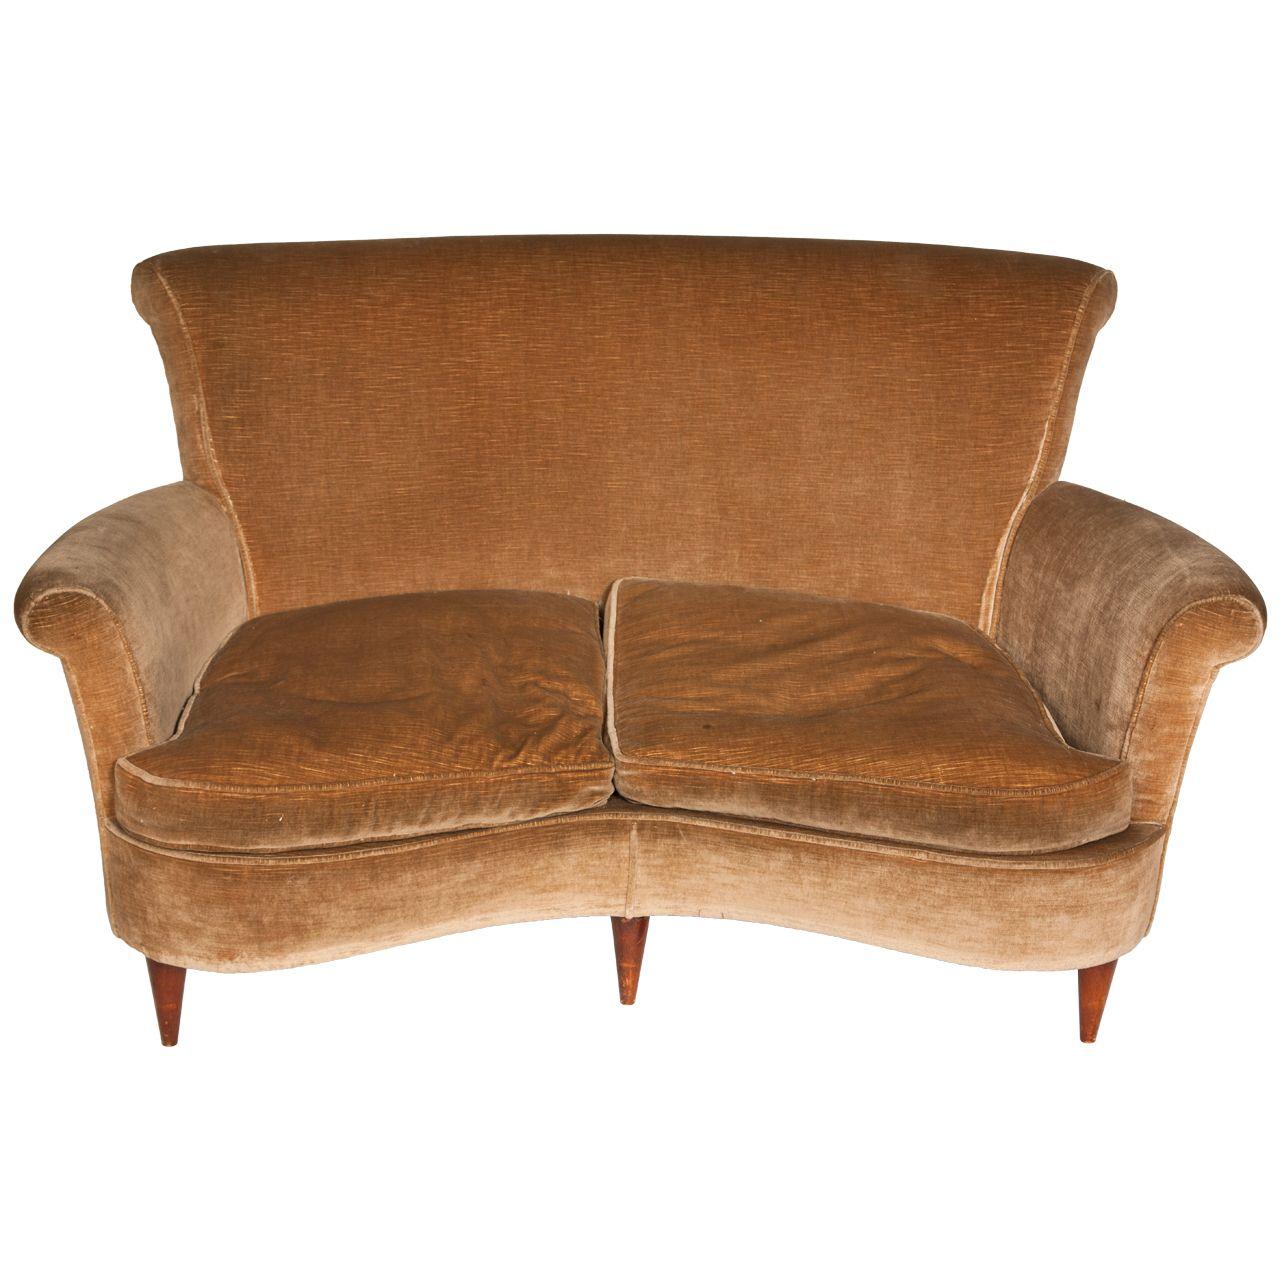 1940s Curved Italian Design Sofa 1stdibs Com Italian Sofa Designs Vintage Sofa Furniture